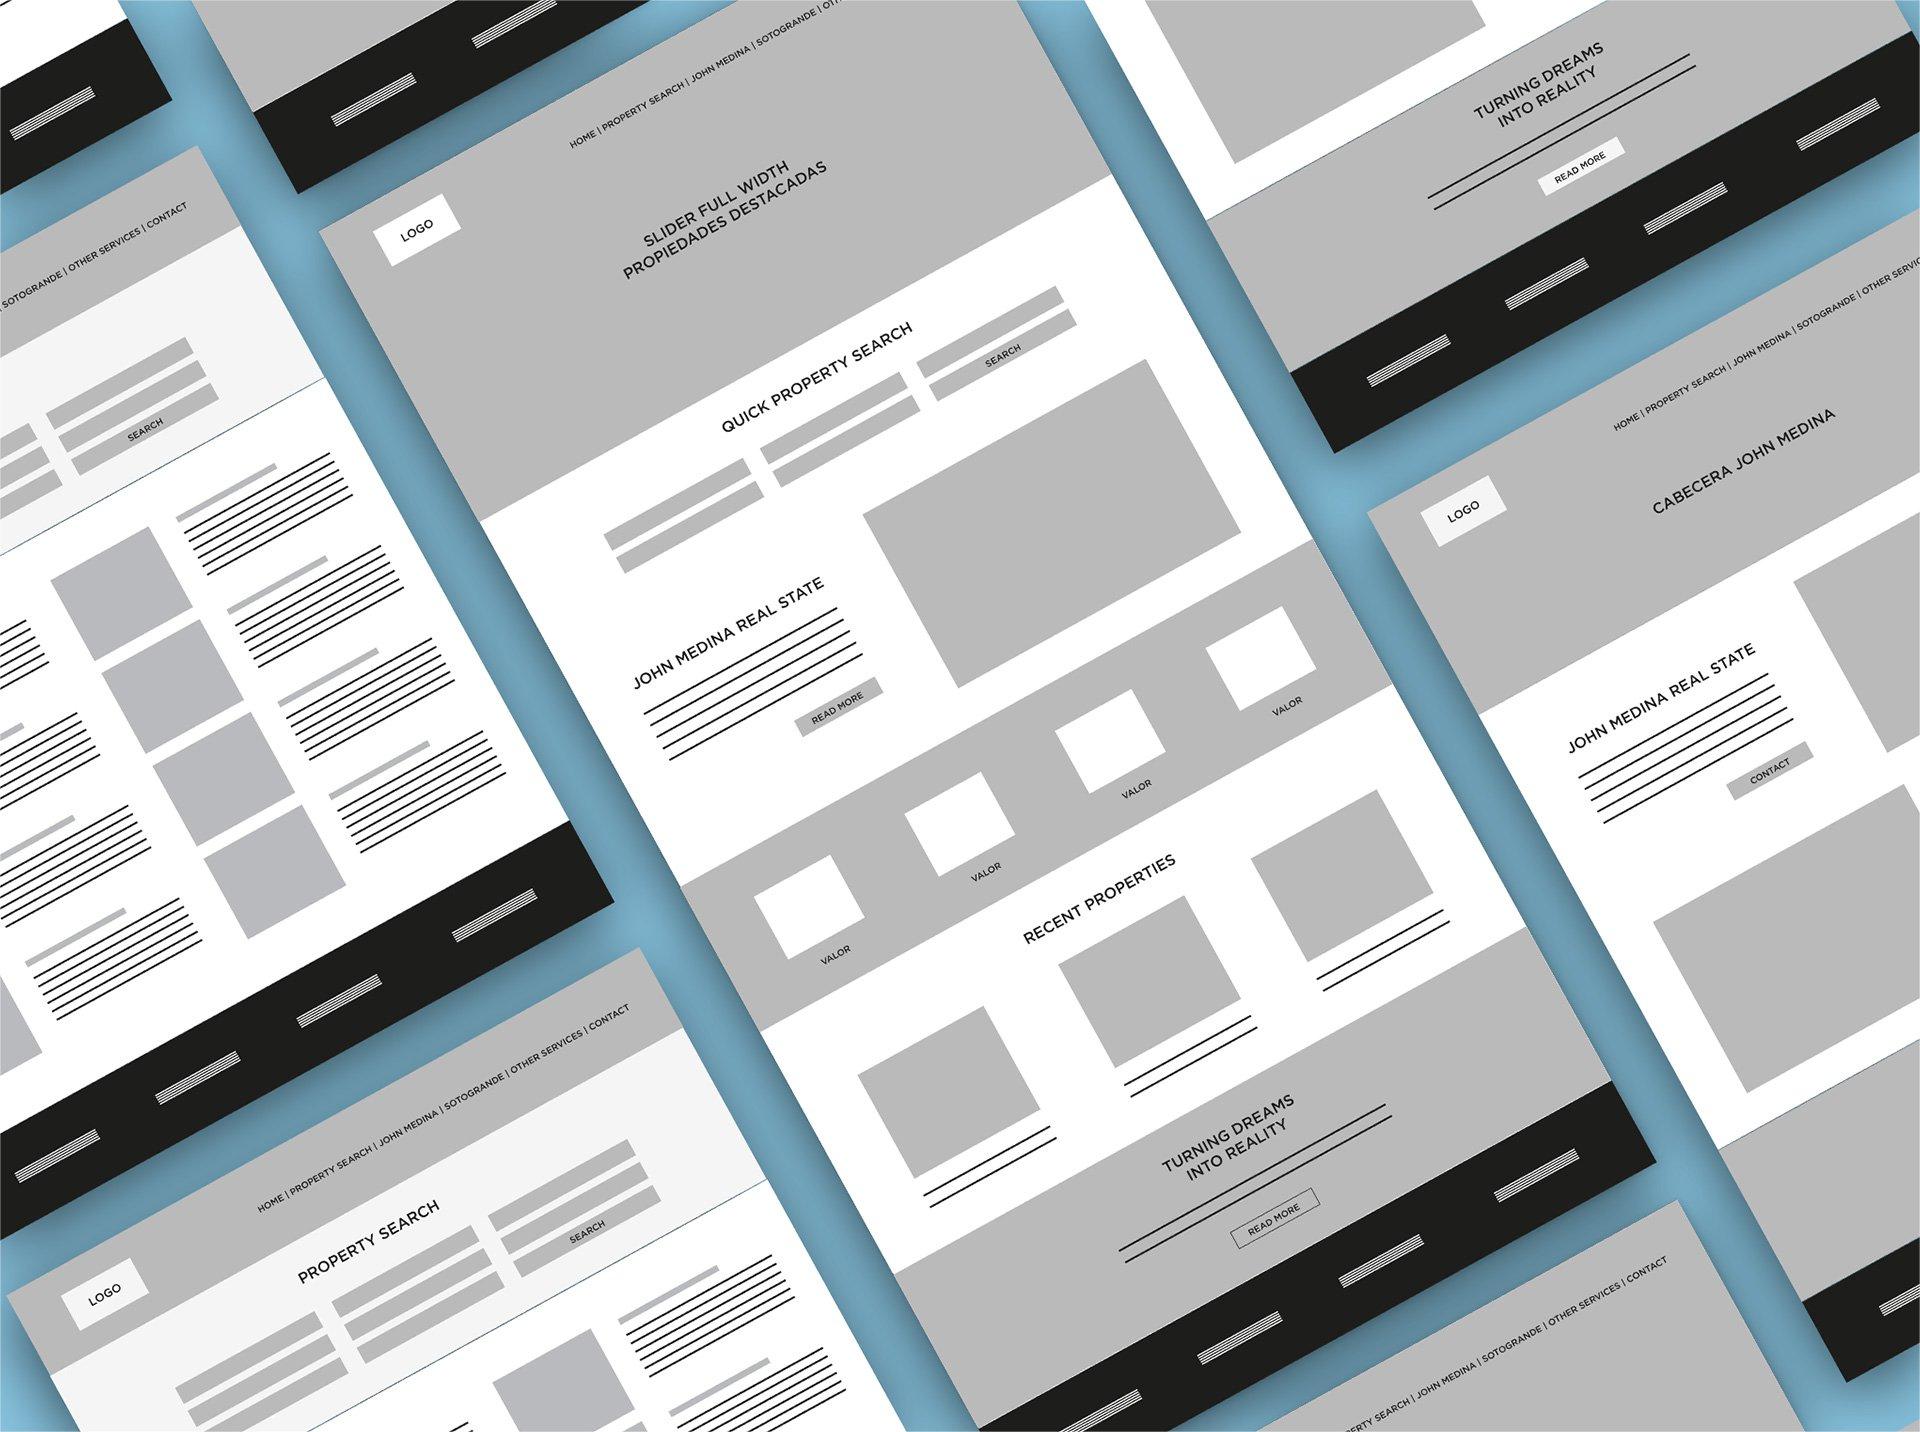 diseño-web-john-medina-agencia-adhoc-4